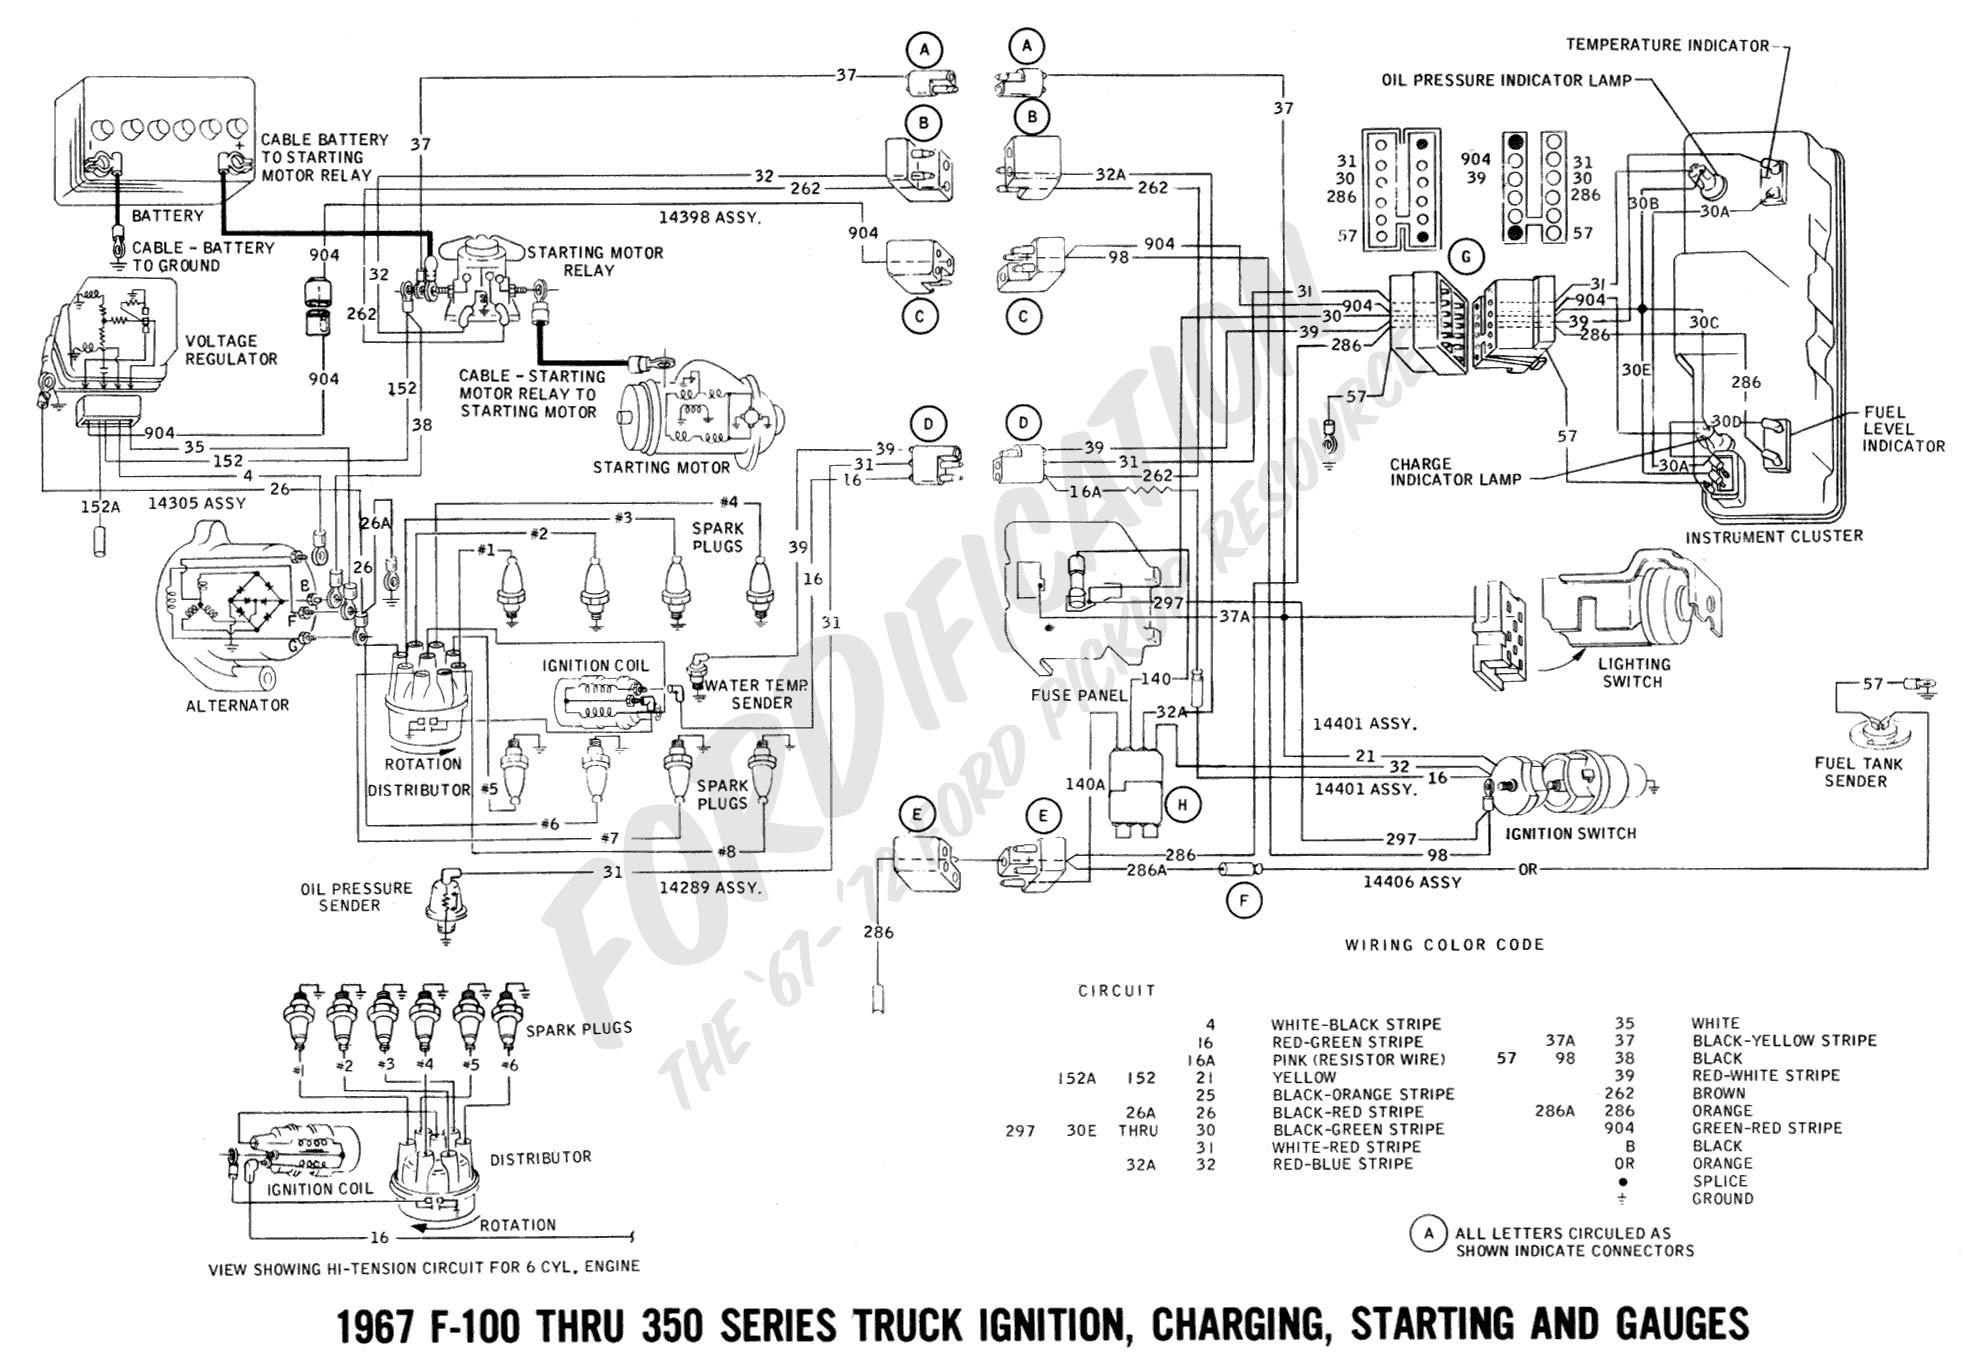 Expedition Engine Diagram - Wiring Diagram & Schemas